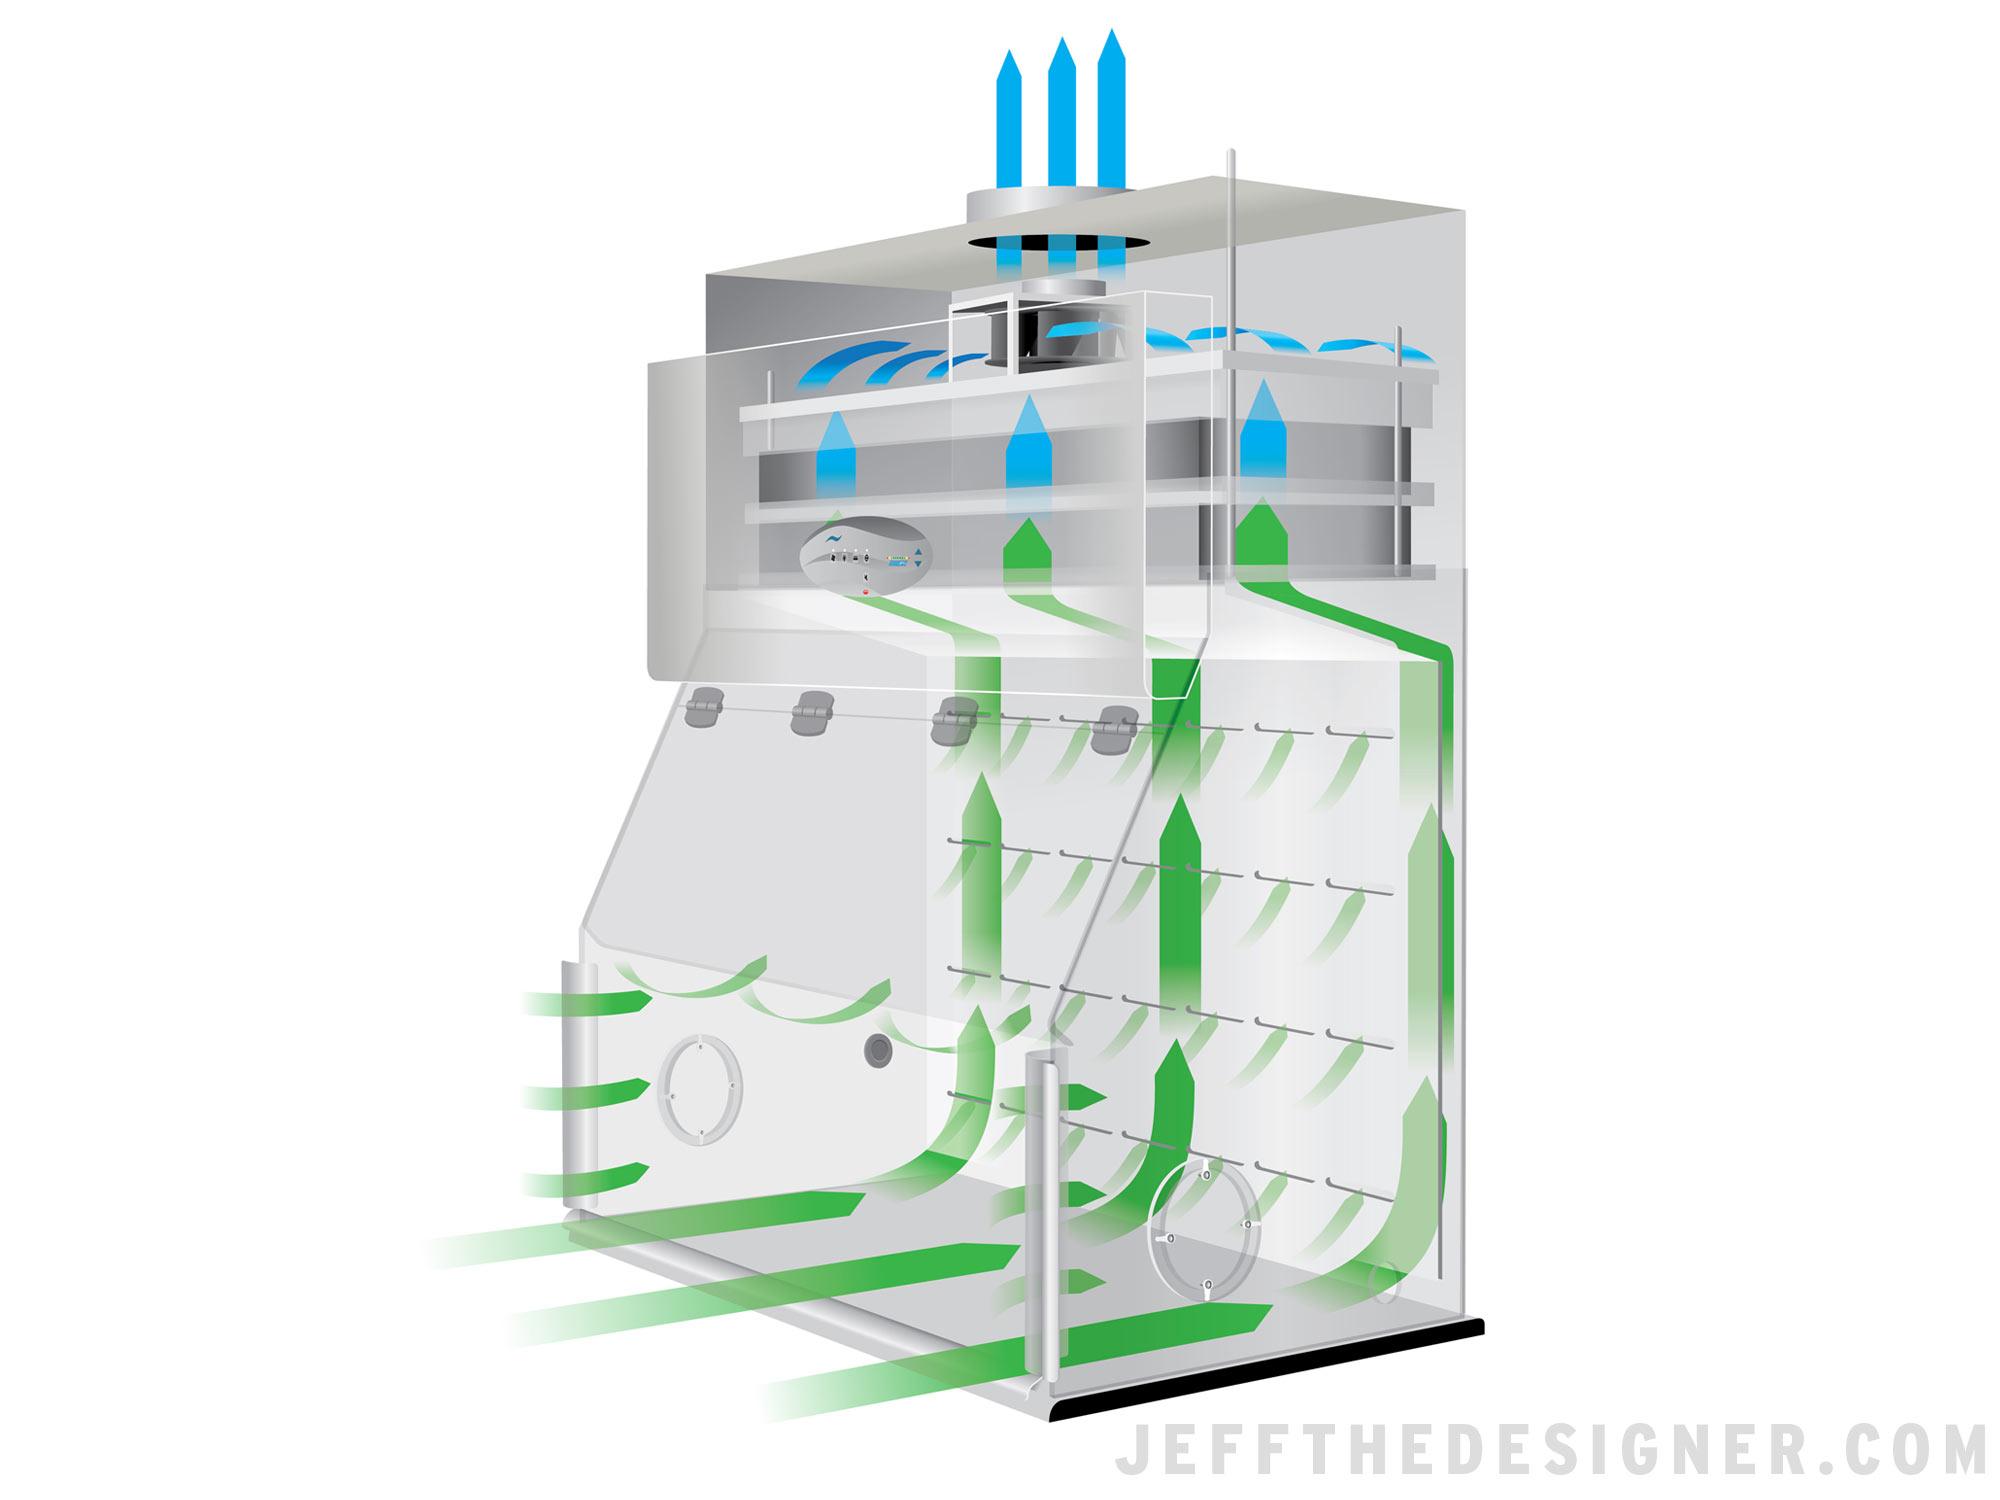 NU-813 Airflow Illustration